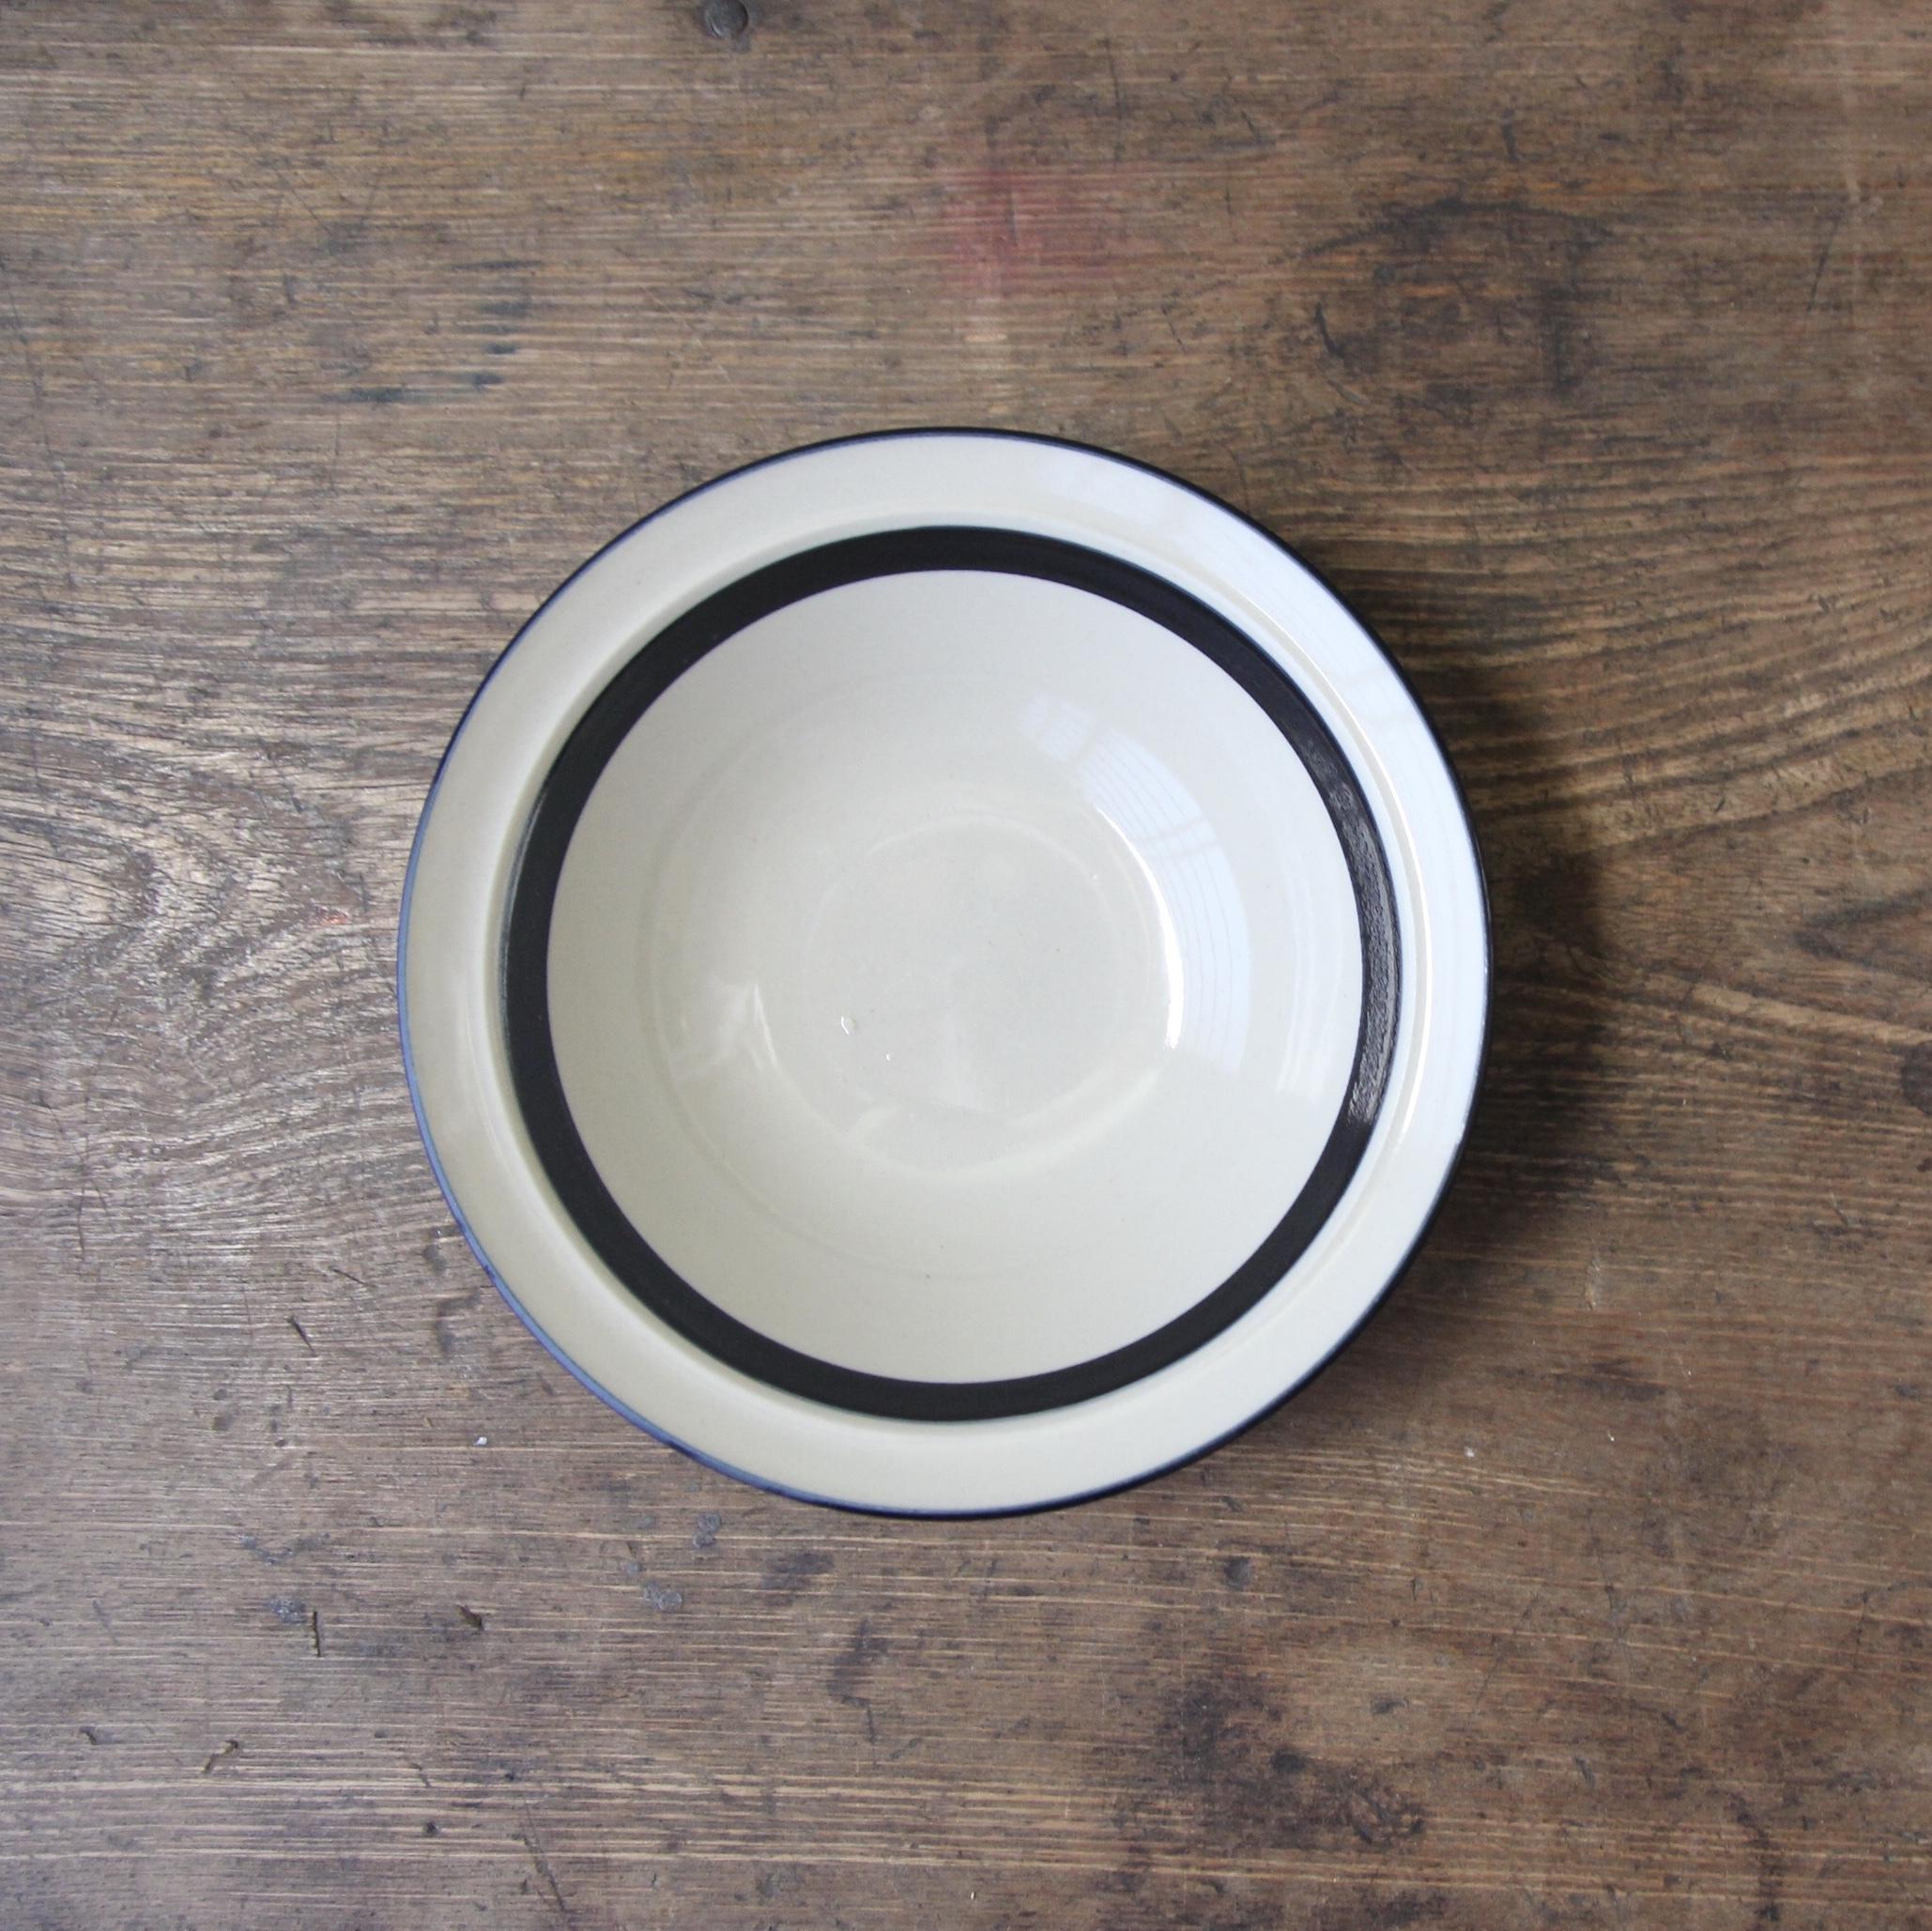 BELL ストーンウェア 小さいボウル皿